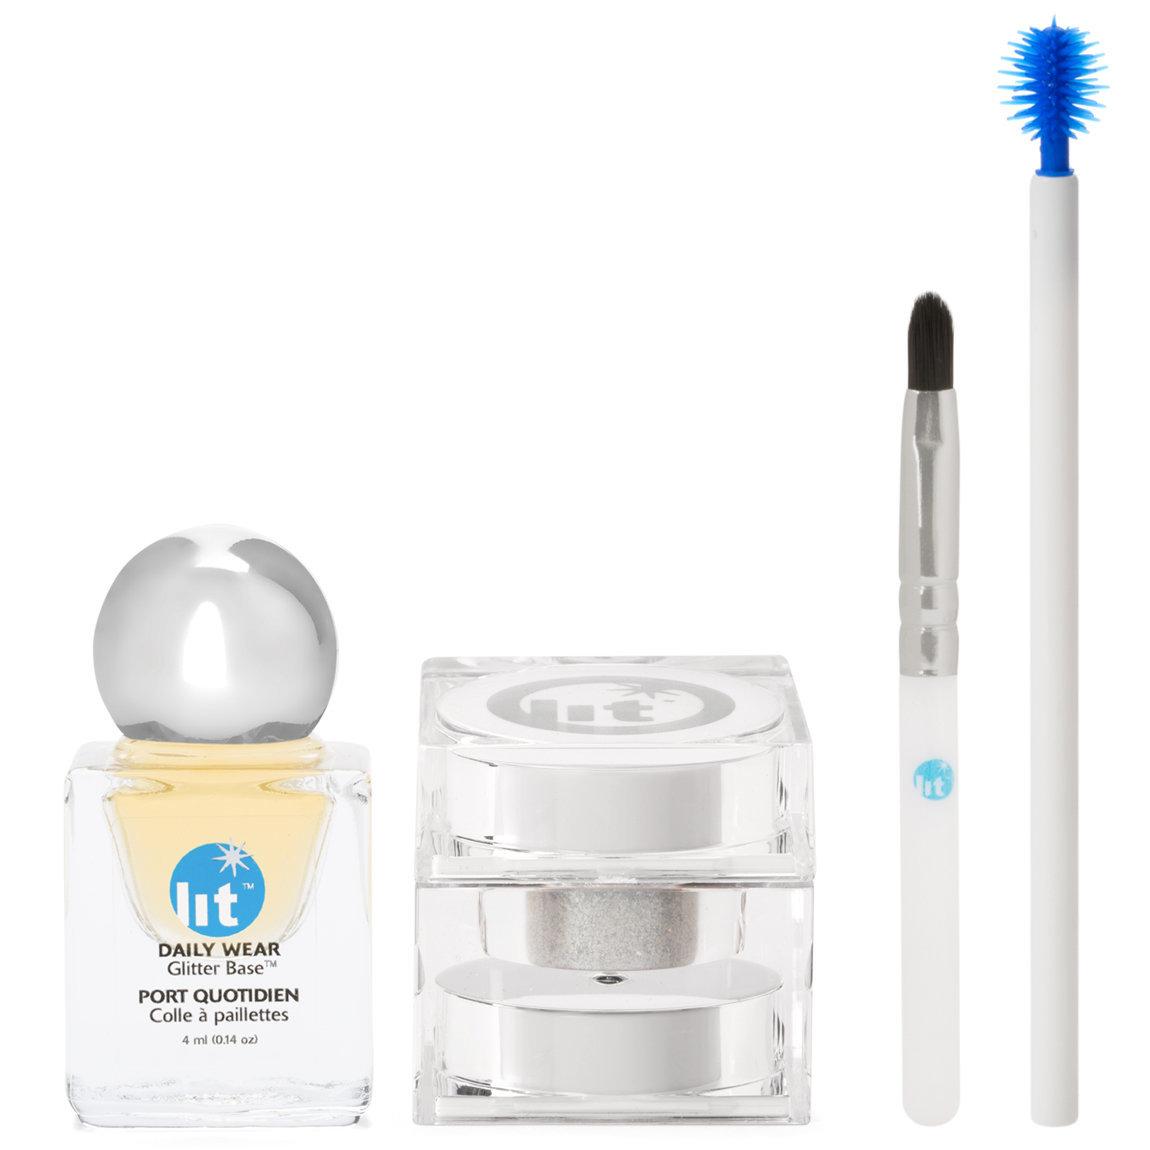 Lit Cosmetics Lit Kit: Lit Metal Kits Magnetic (Silver) alternative view 1.